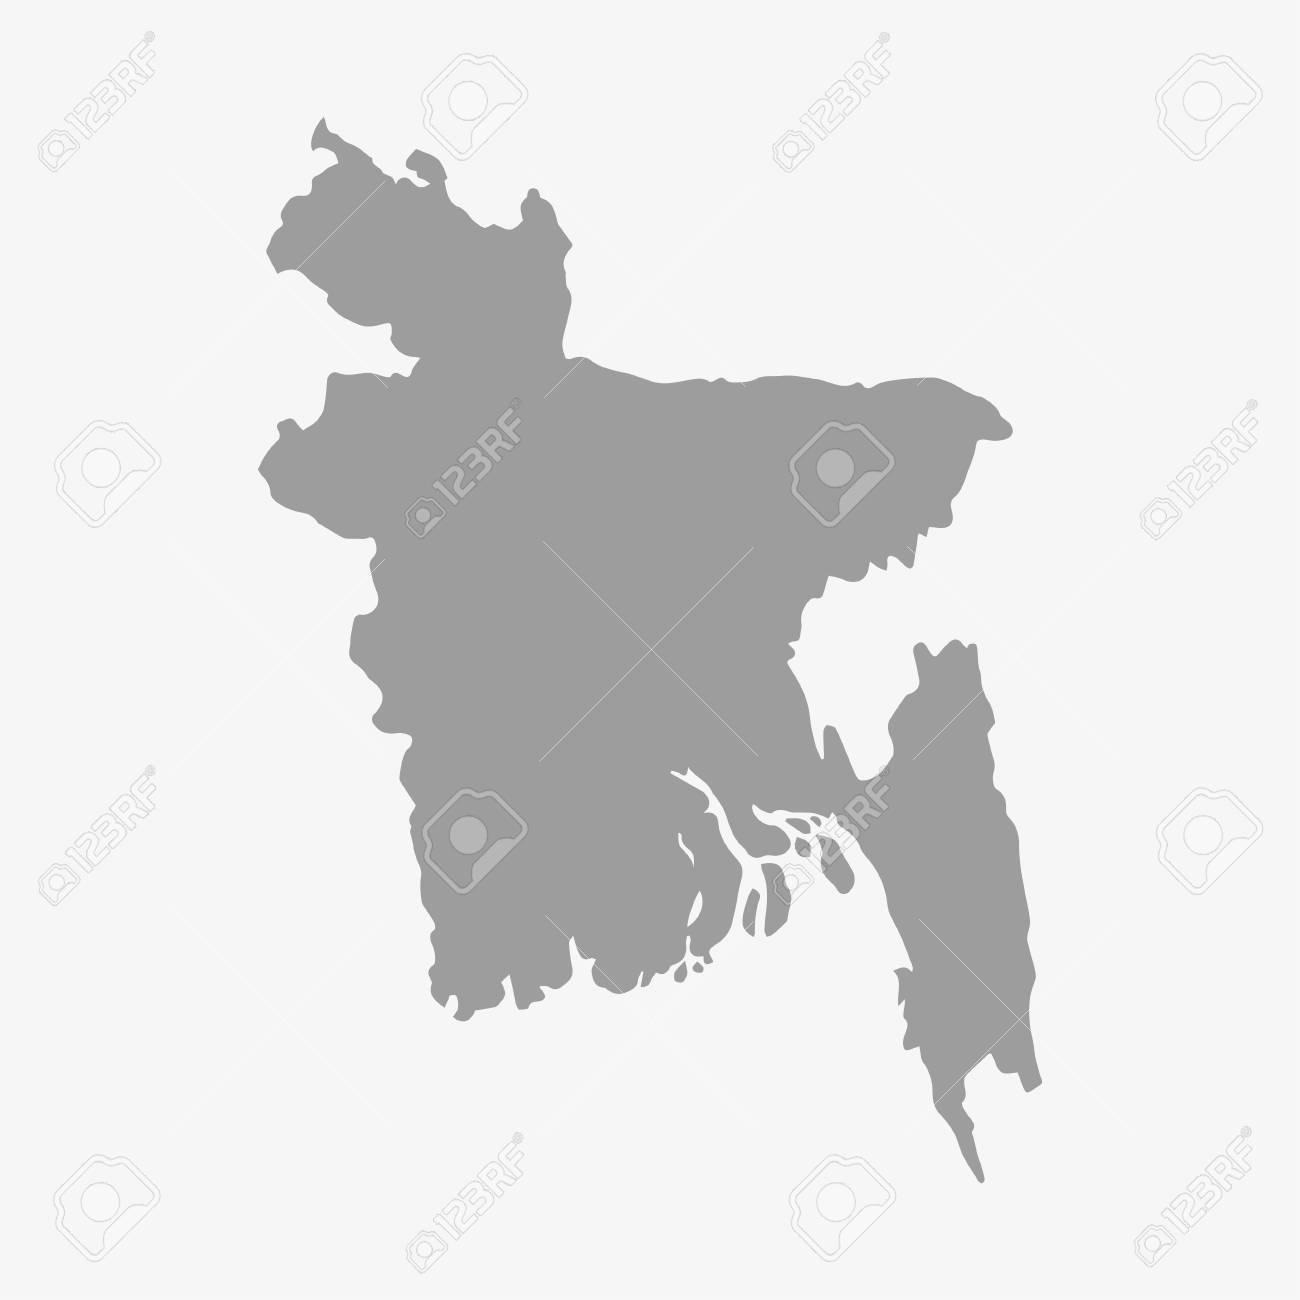 hd map of bangladesh Bangladesh Map In Gray On A White Background Royalty Free Cliparts hd map of bangladesh